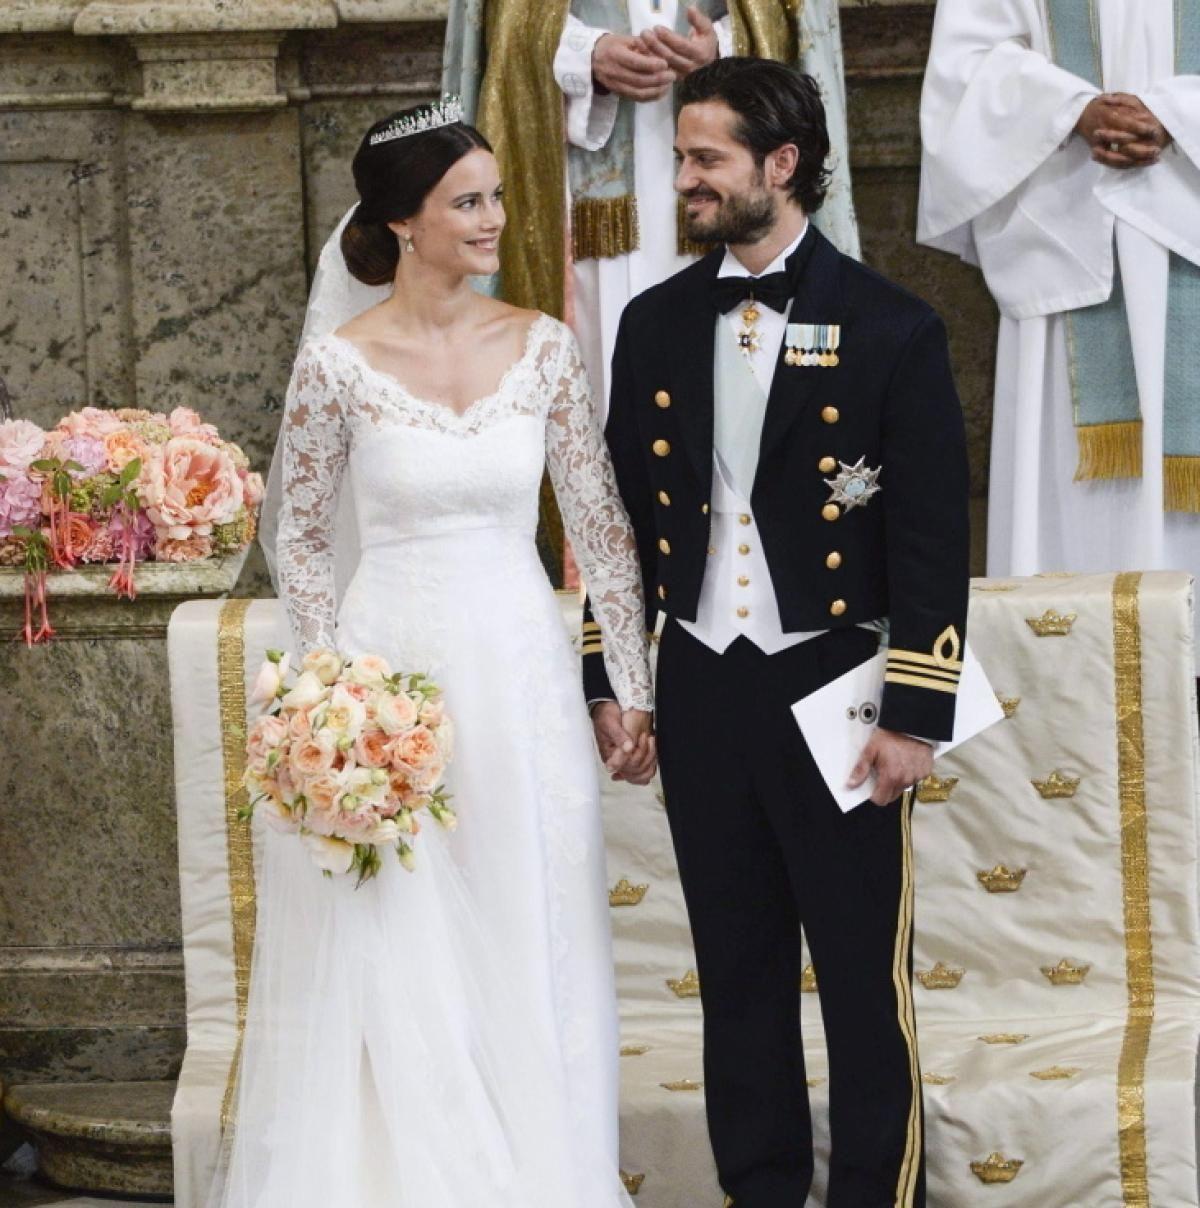 2019 Jennie Garth Wedding Dress Dresses For Wedding Reception Check More At Http Svesty Com Jennie Garth Wedding Dress